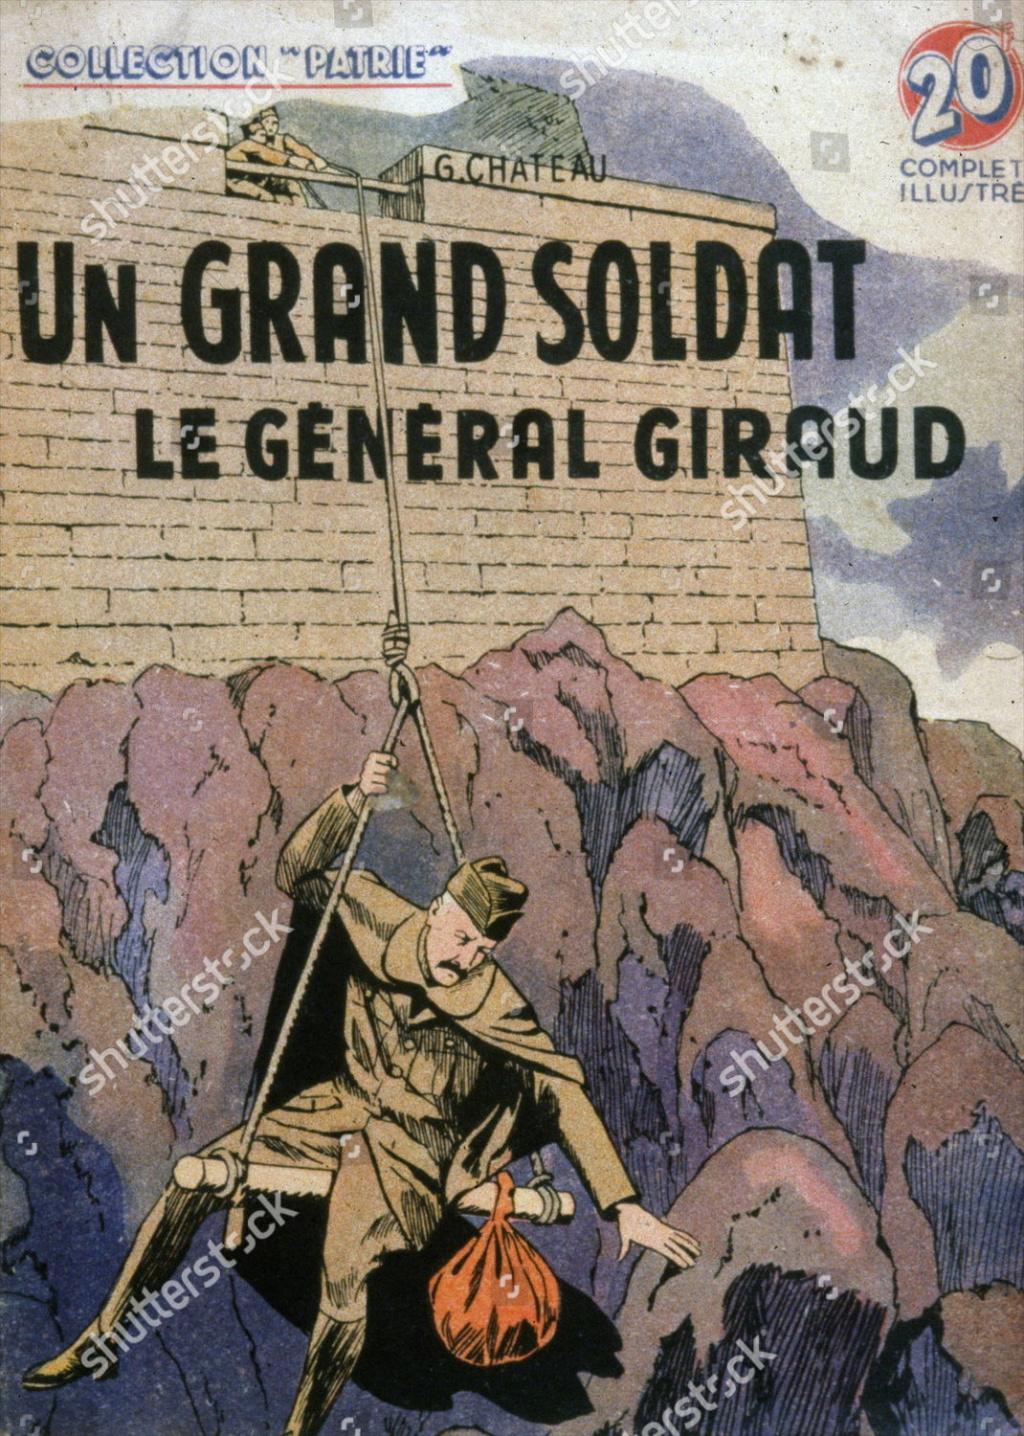 Généraux prisonniers - Page 24 Giraud13